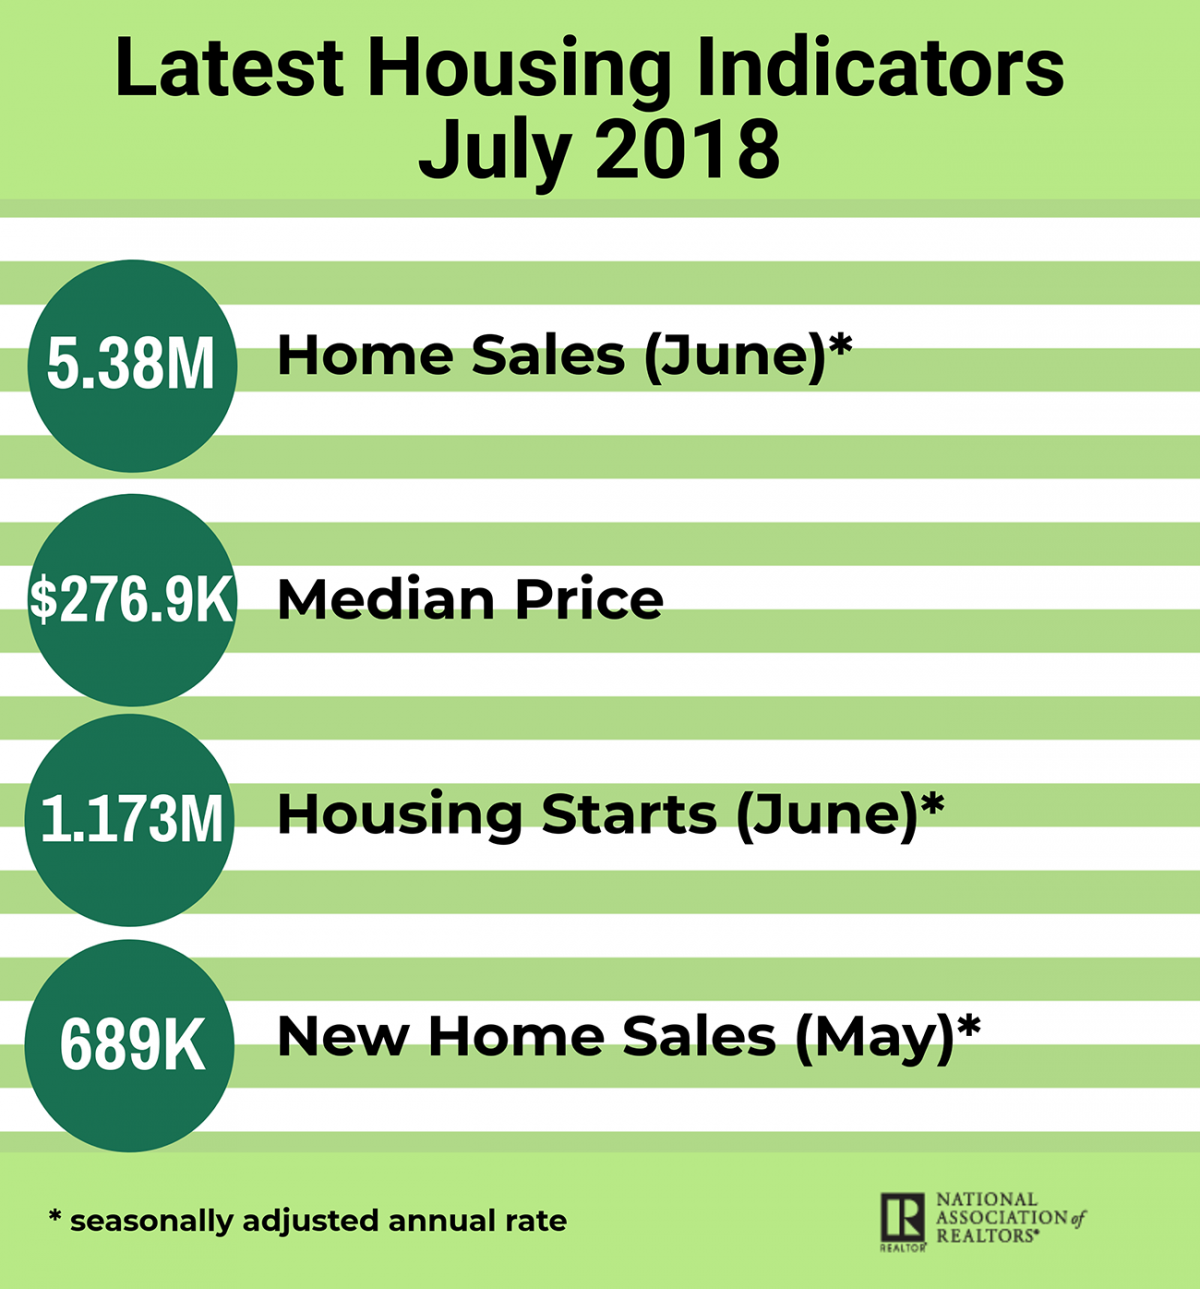 Infographic: July 2018 Housing Indicators